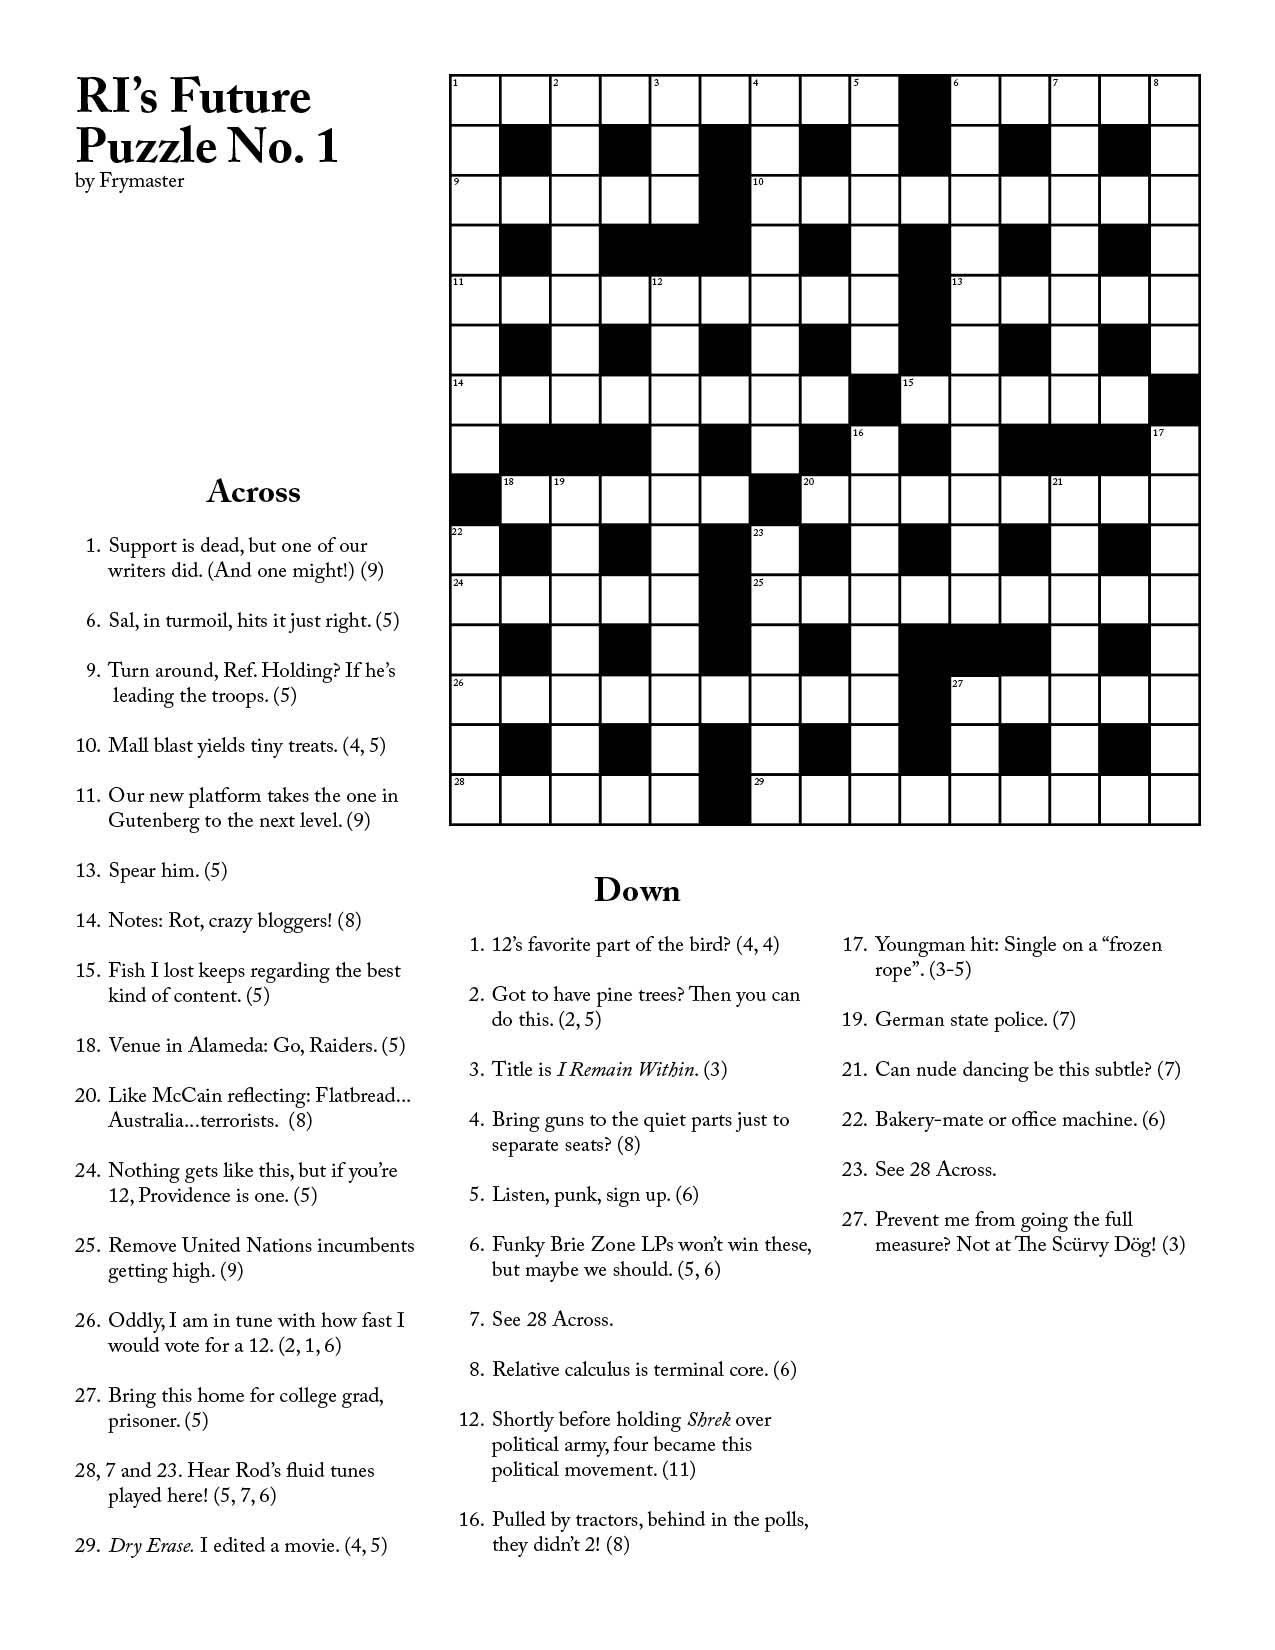 Ri Future Cryptic Crossword #1 - Printable Cryptic Crossword Puzzles